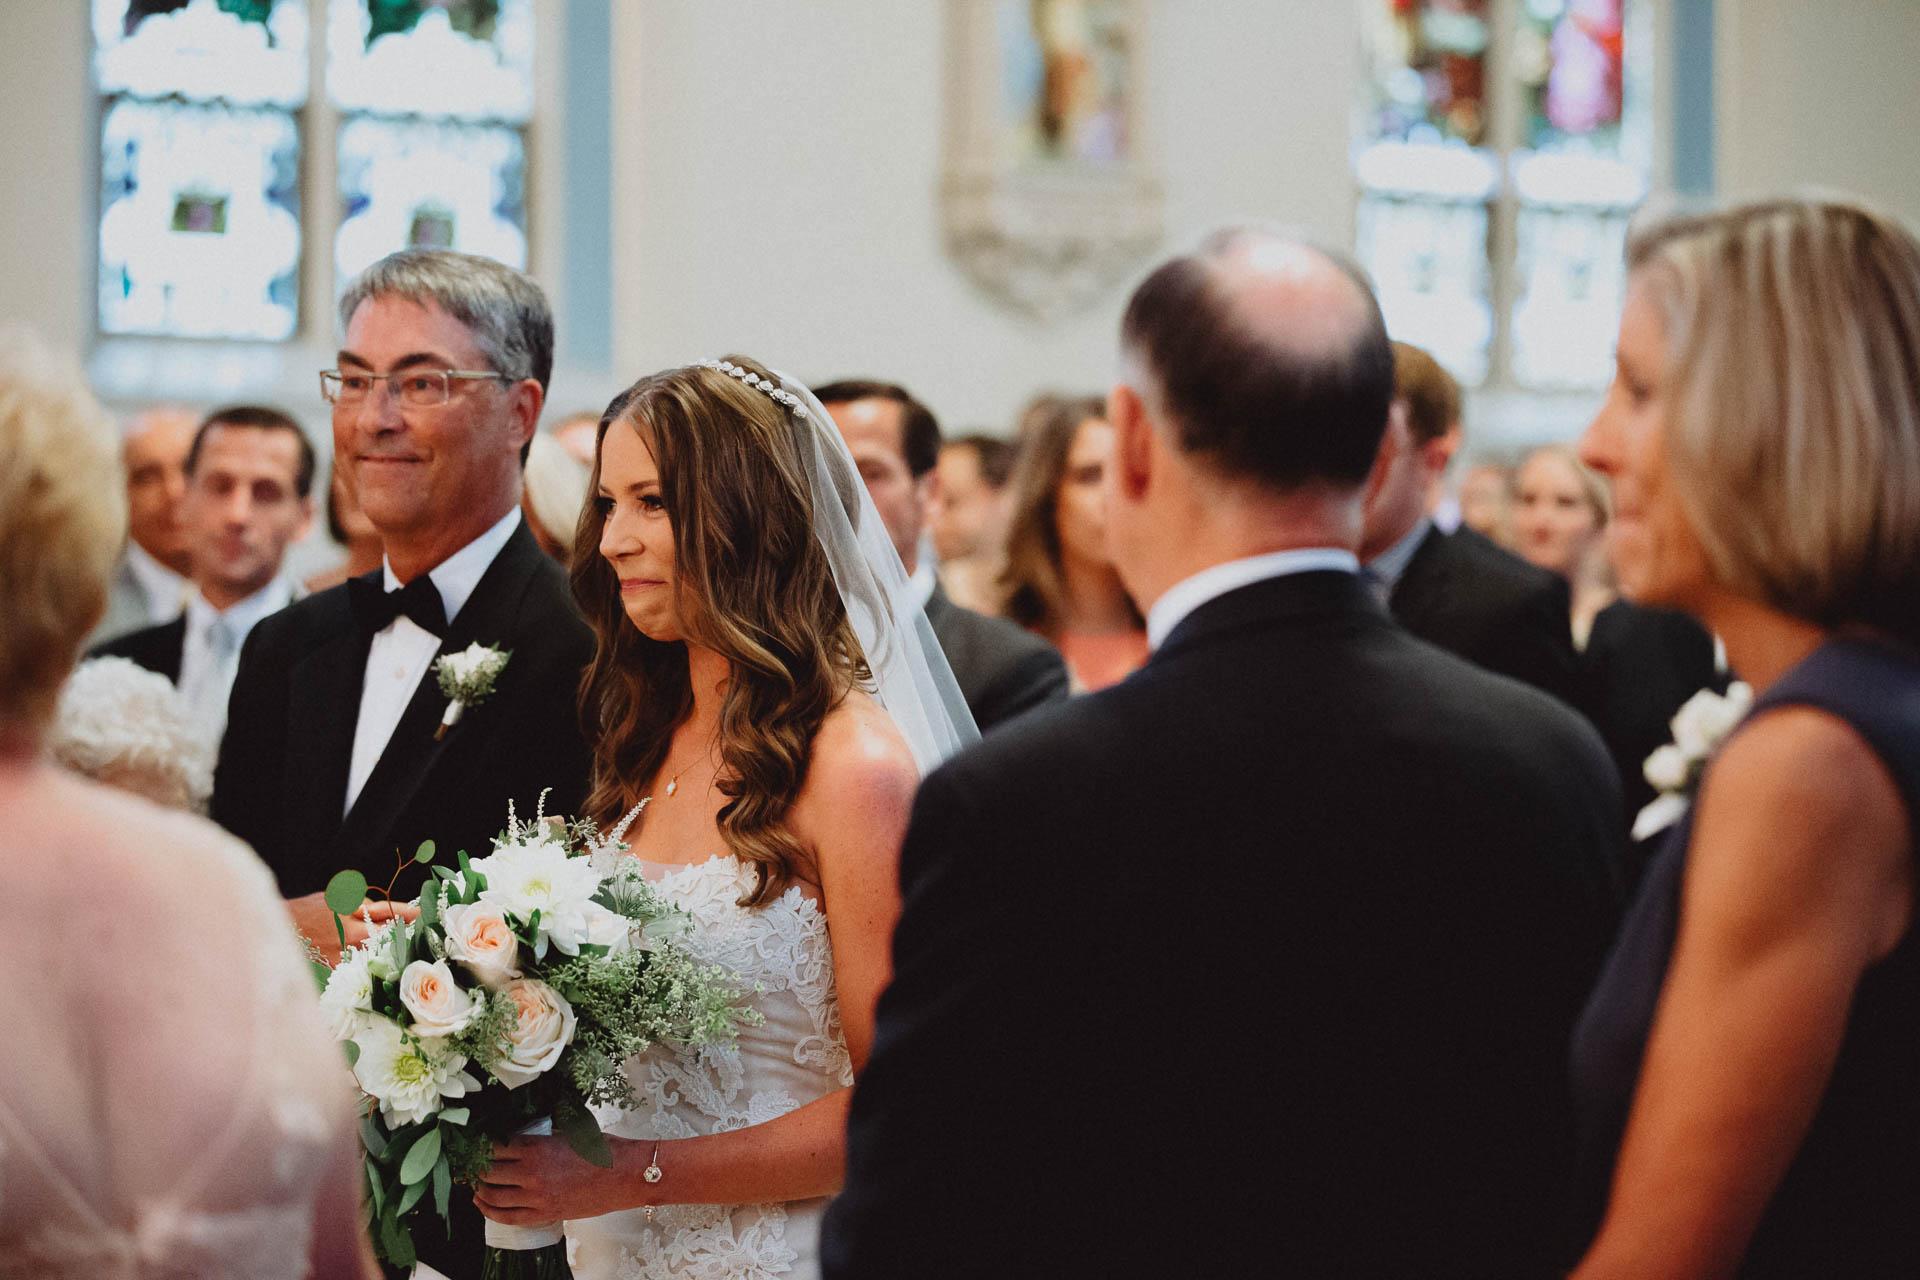 Keri-Joseph-Top-of-the-Market-Wedding-070@2x.jpg